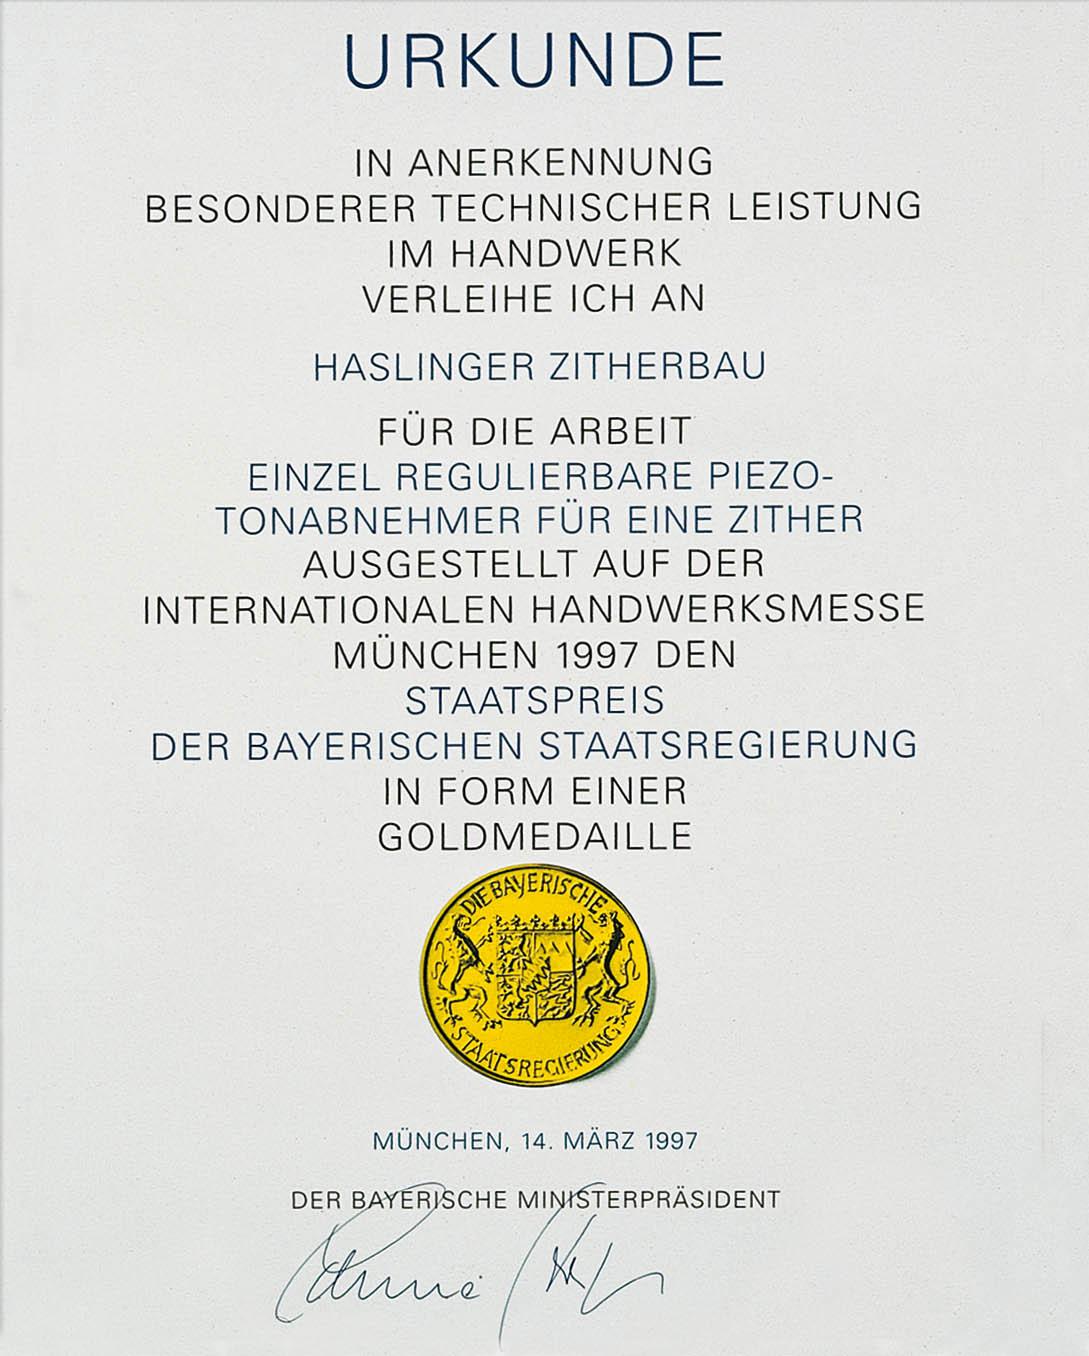 urkunde-staatspreis-001